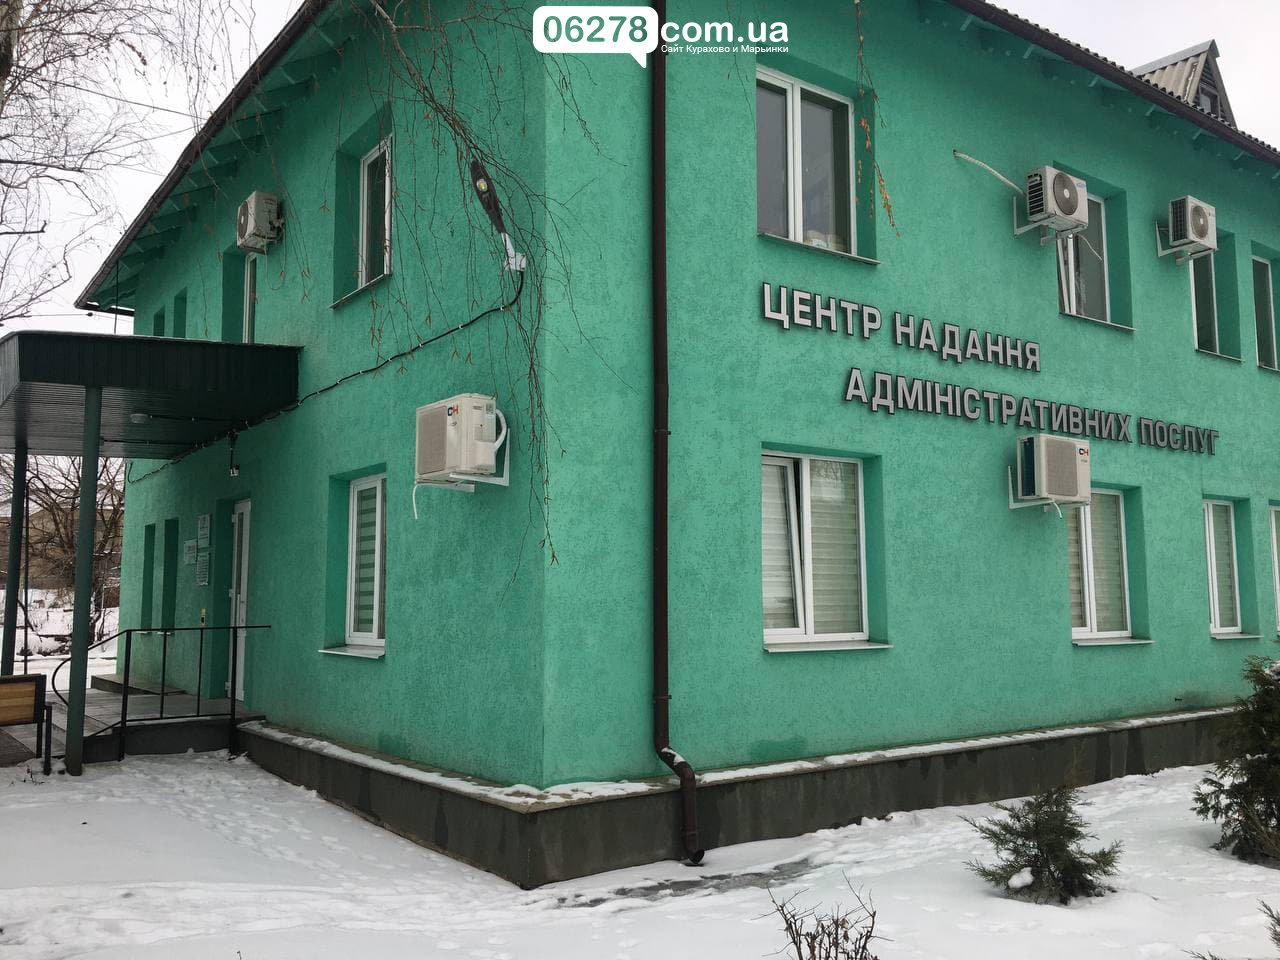 ЦНАП в Курахово, Новости Курахово